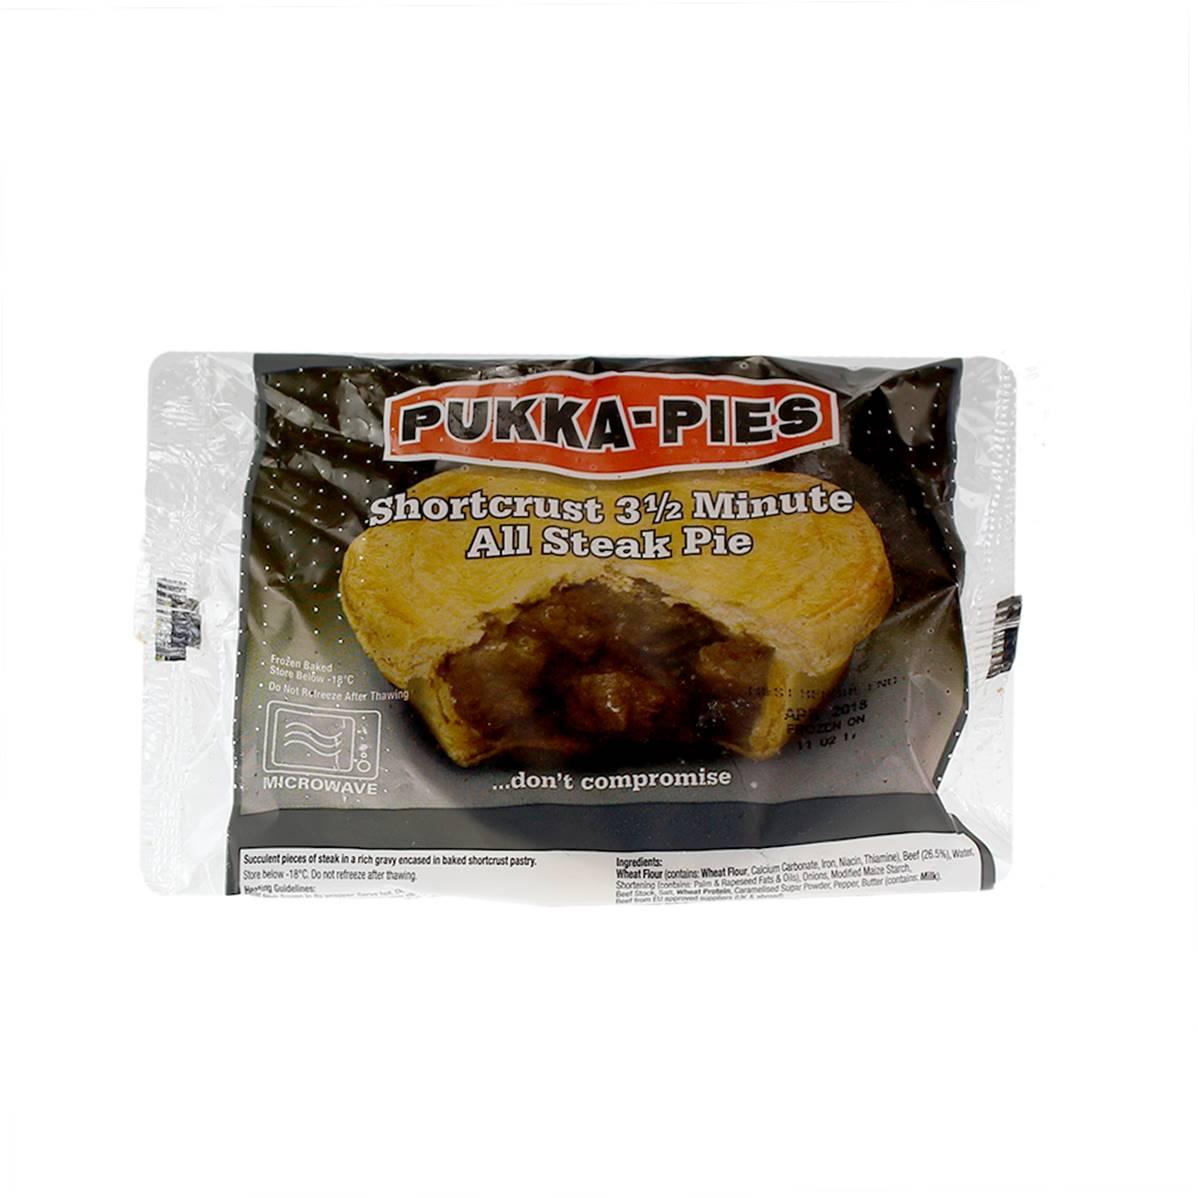 Pukka 3.5min Microwaveable Steak Pie